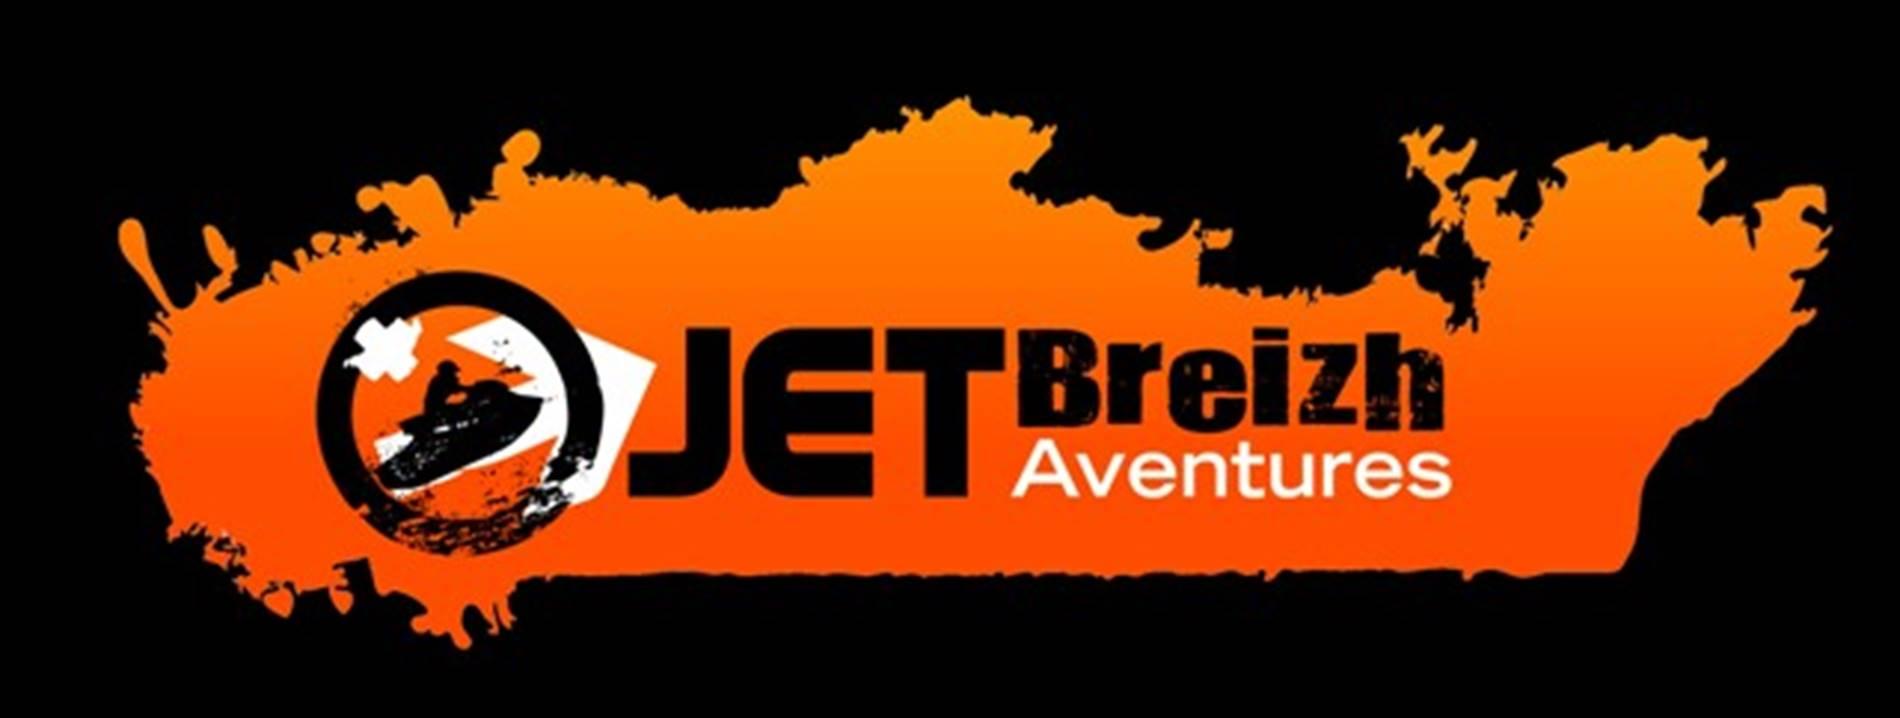 Jet Breizh Aventures © Jet Breizh Aventures